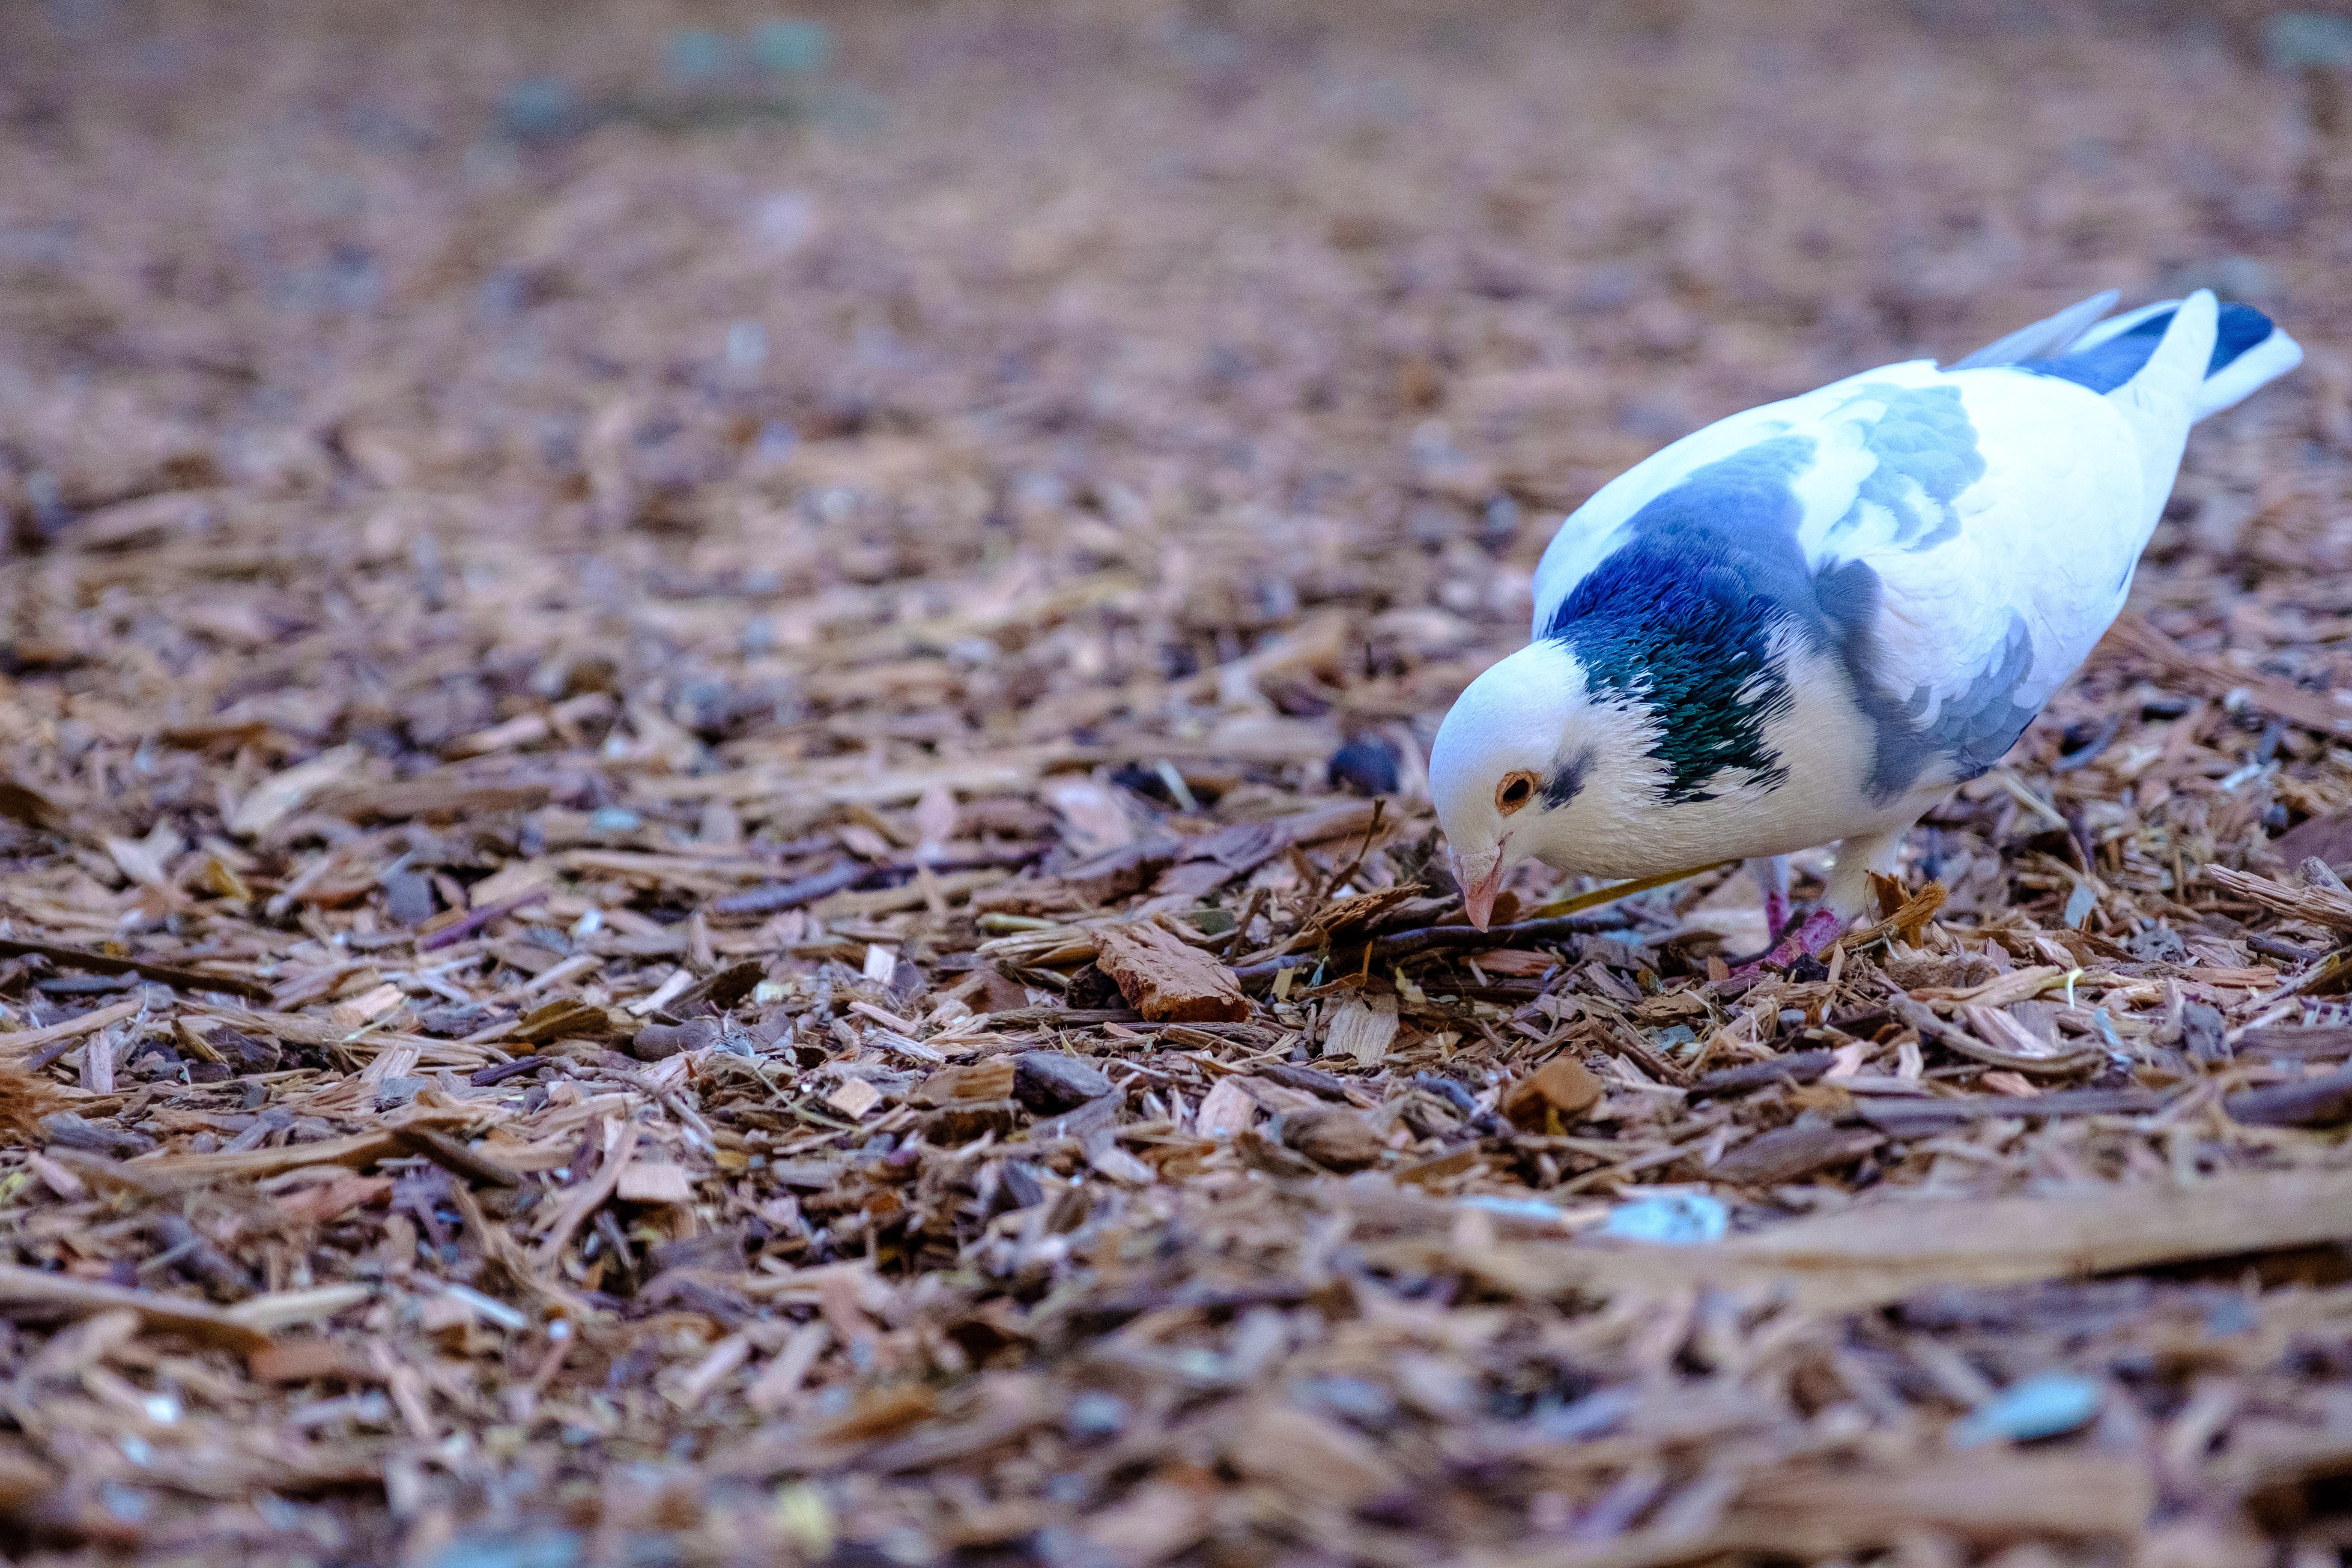 white and black bird standing on ground